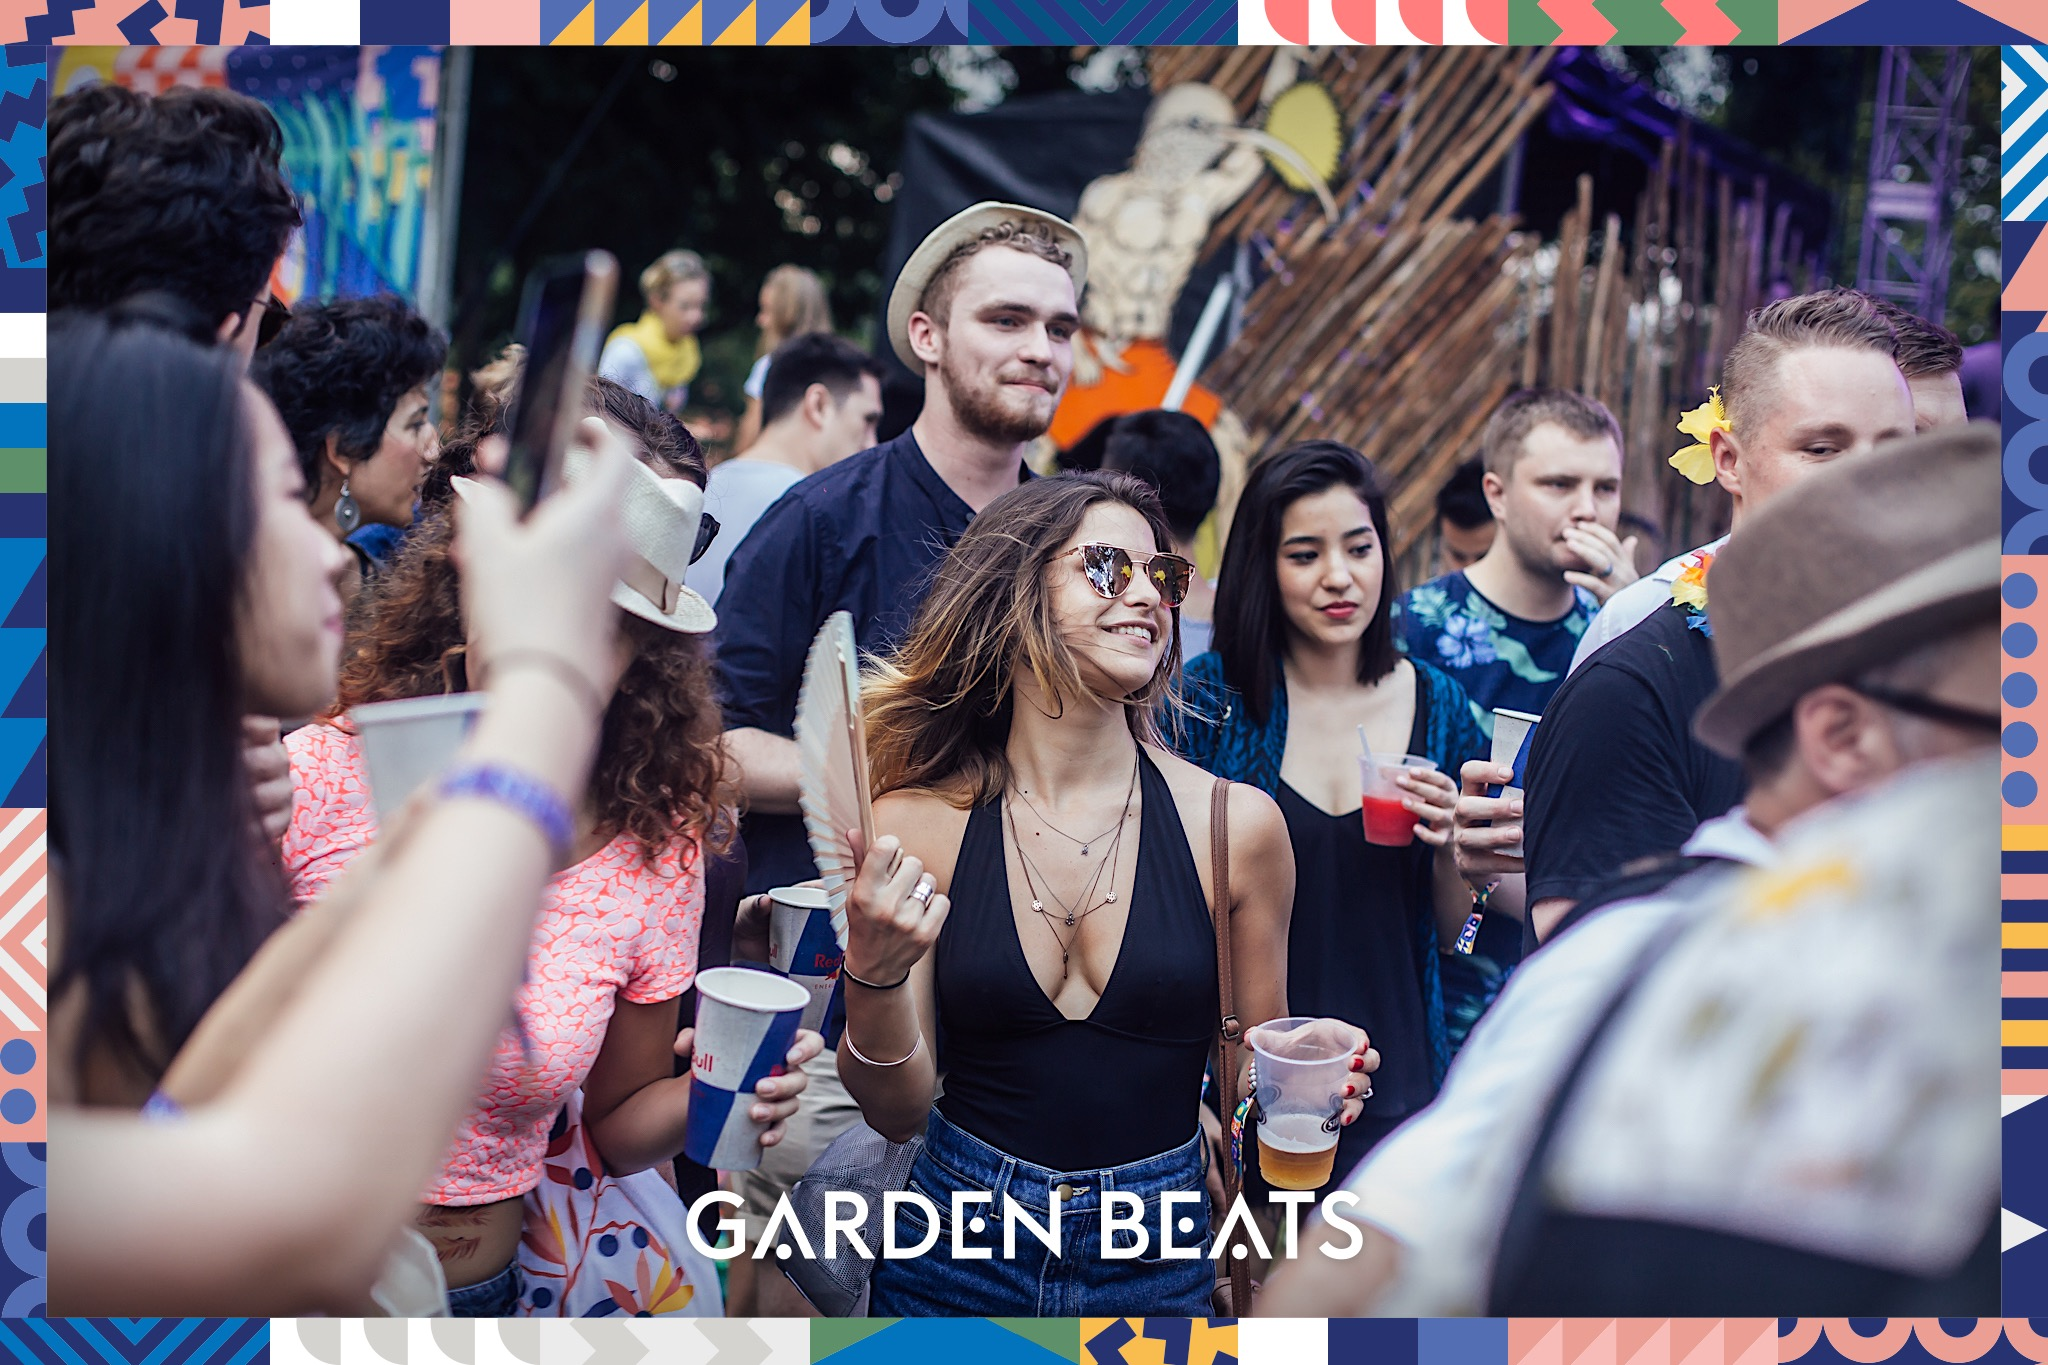 18032017_GardenBeats_Colossal618_WatermarkedGB.jpg